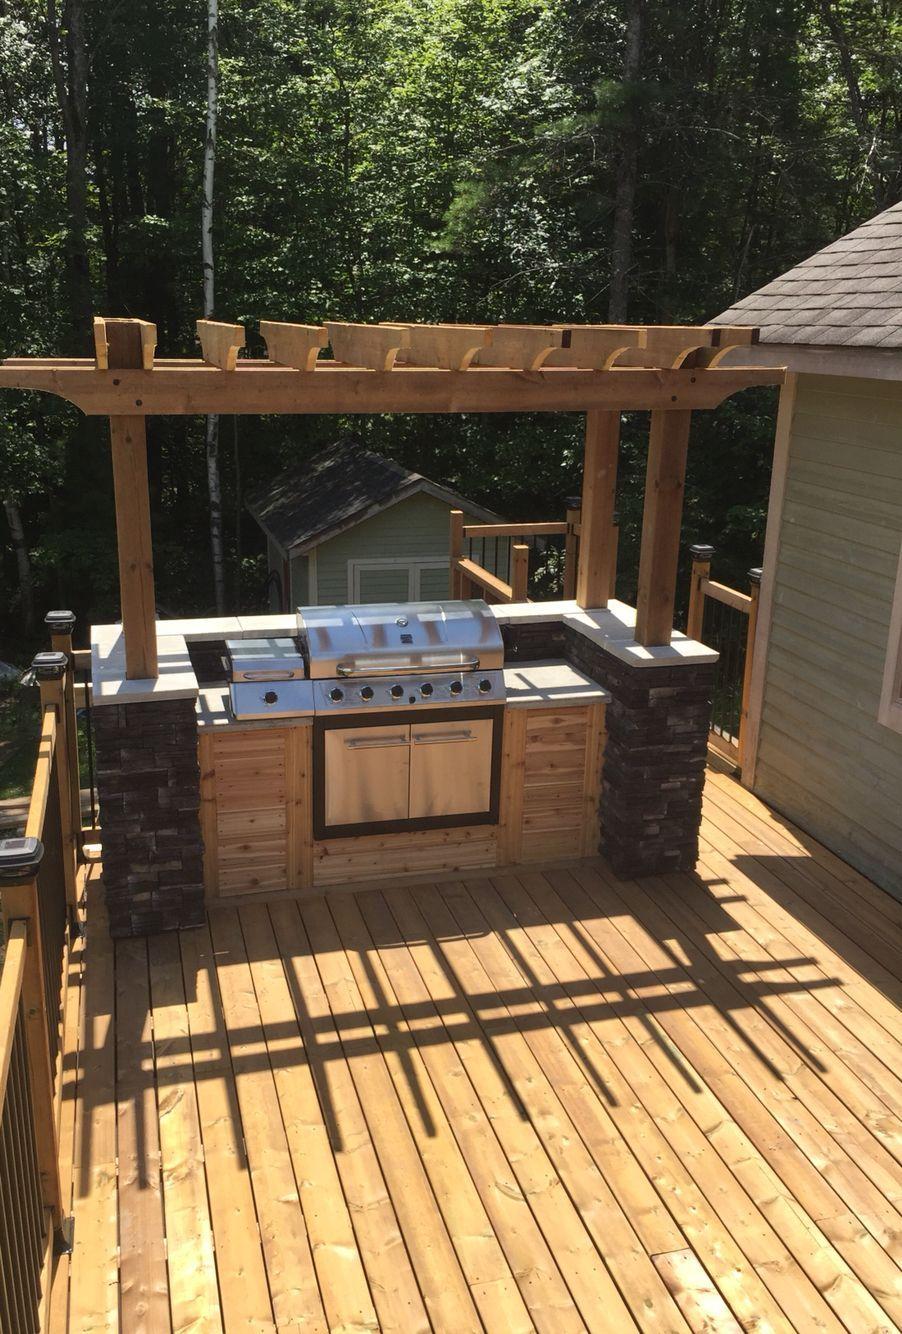 Garden decor kijiji  Outdoor BBQ Island built on my parents deck in Muskoka  Backyard